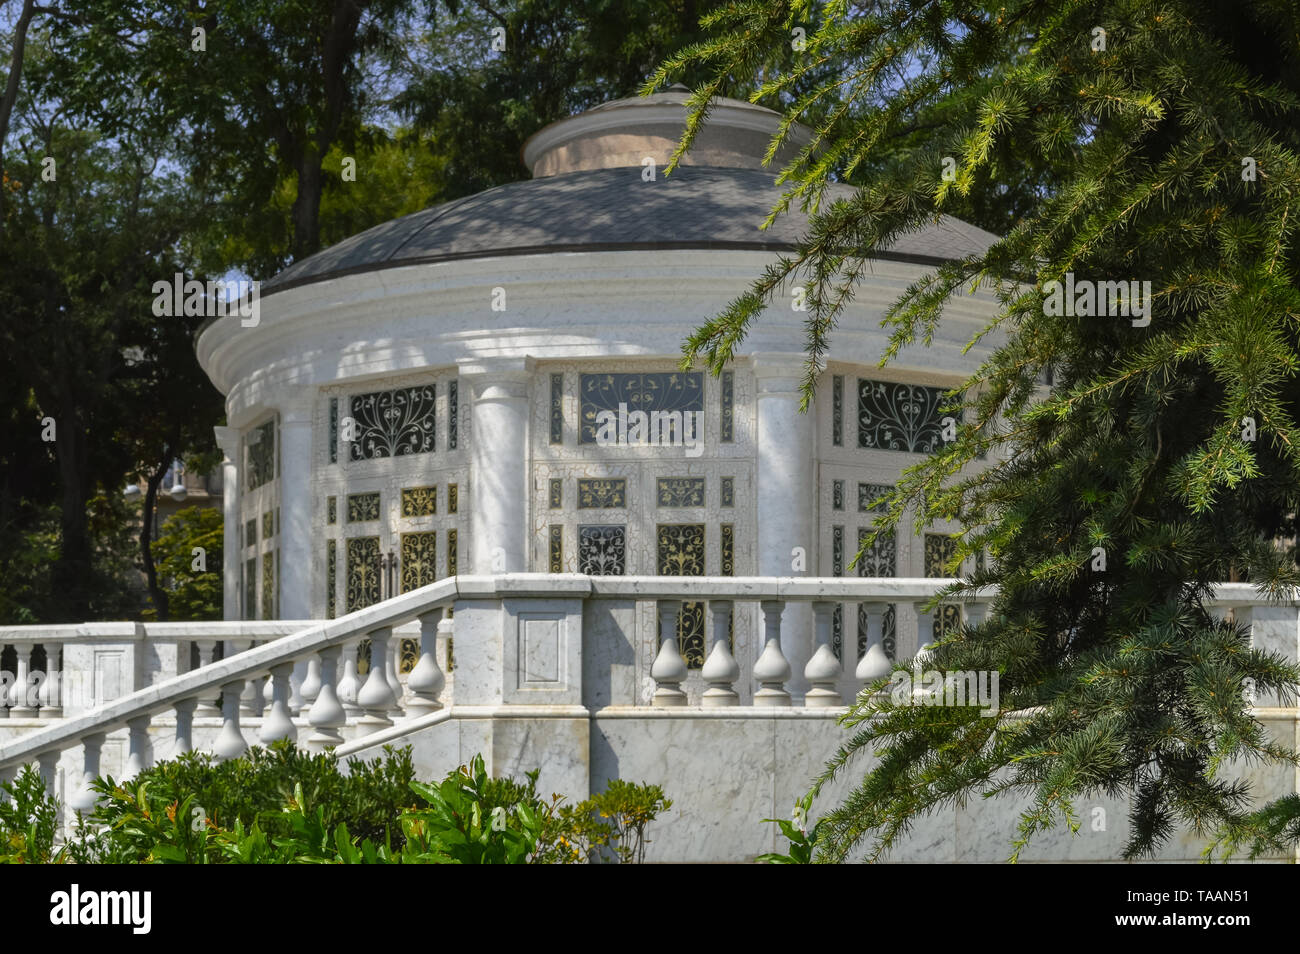 pavilion in Philharmonic Fountain Park in Baku, Azerbaijan - Stock Image